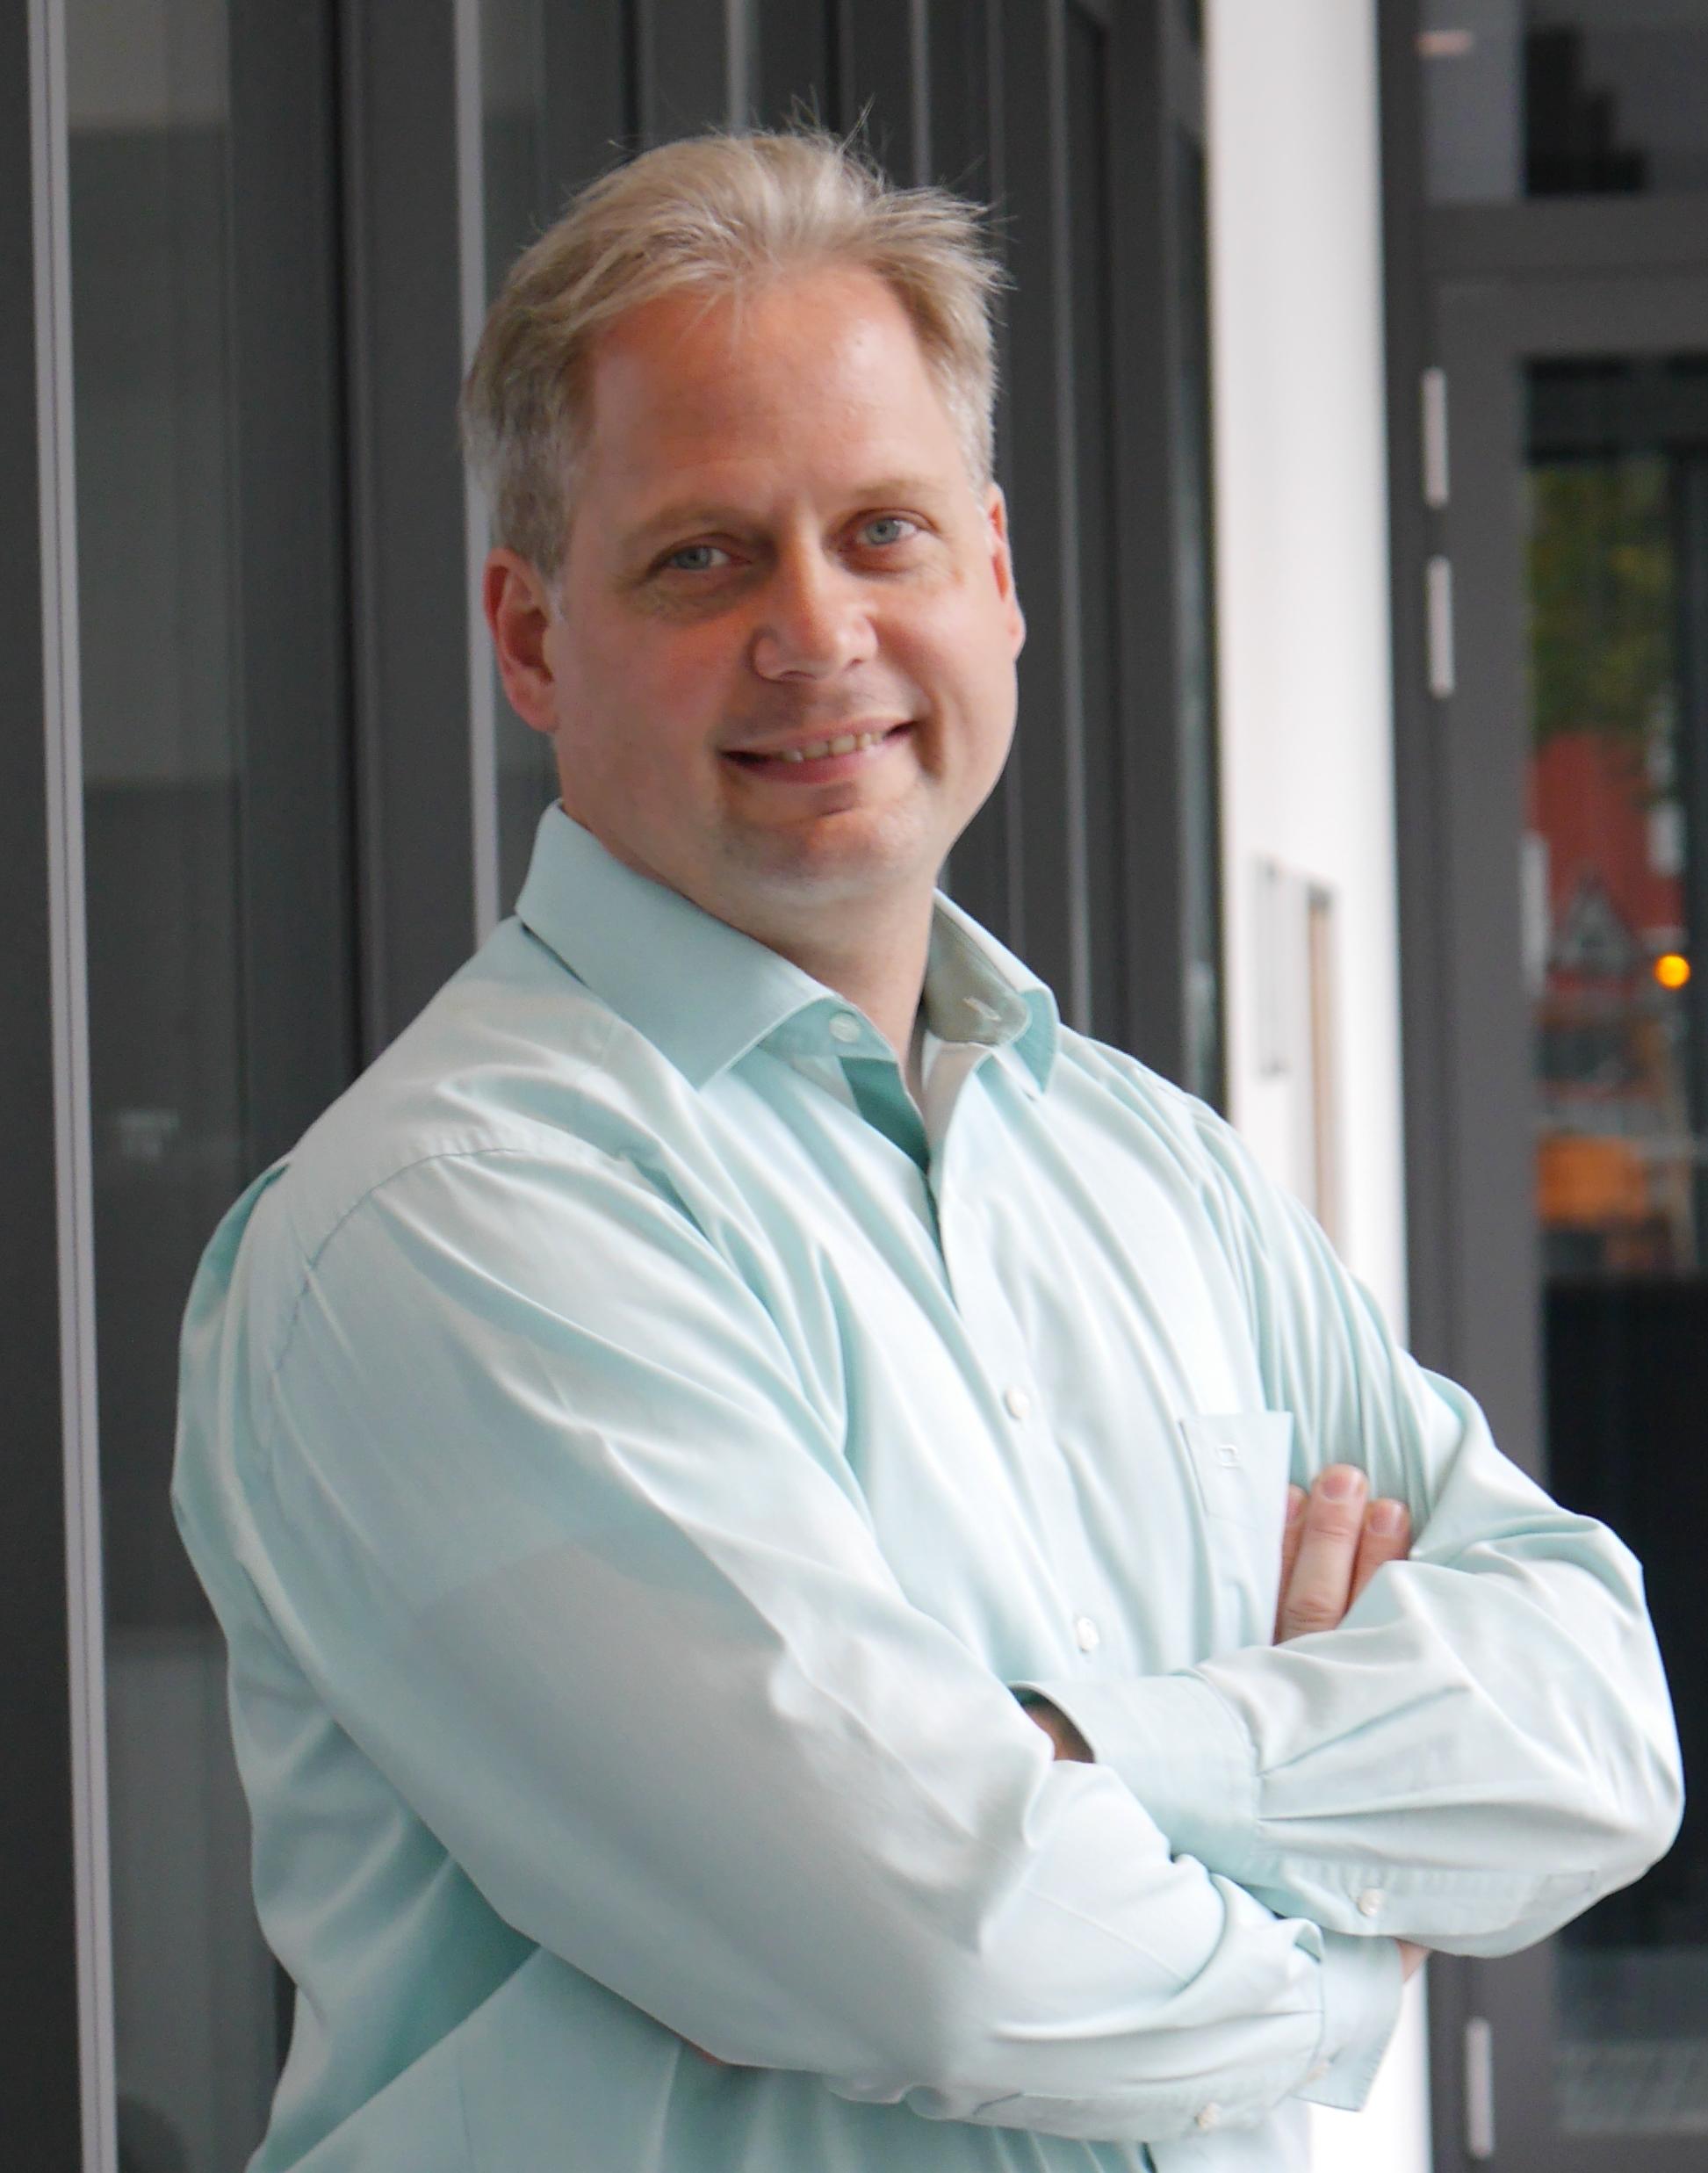 Dr. Carsten Wilks